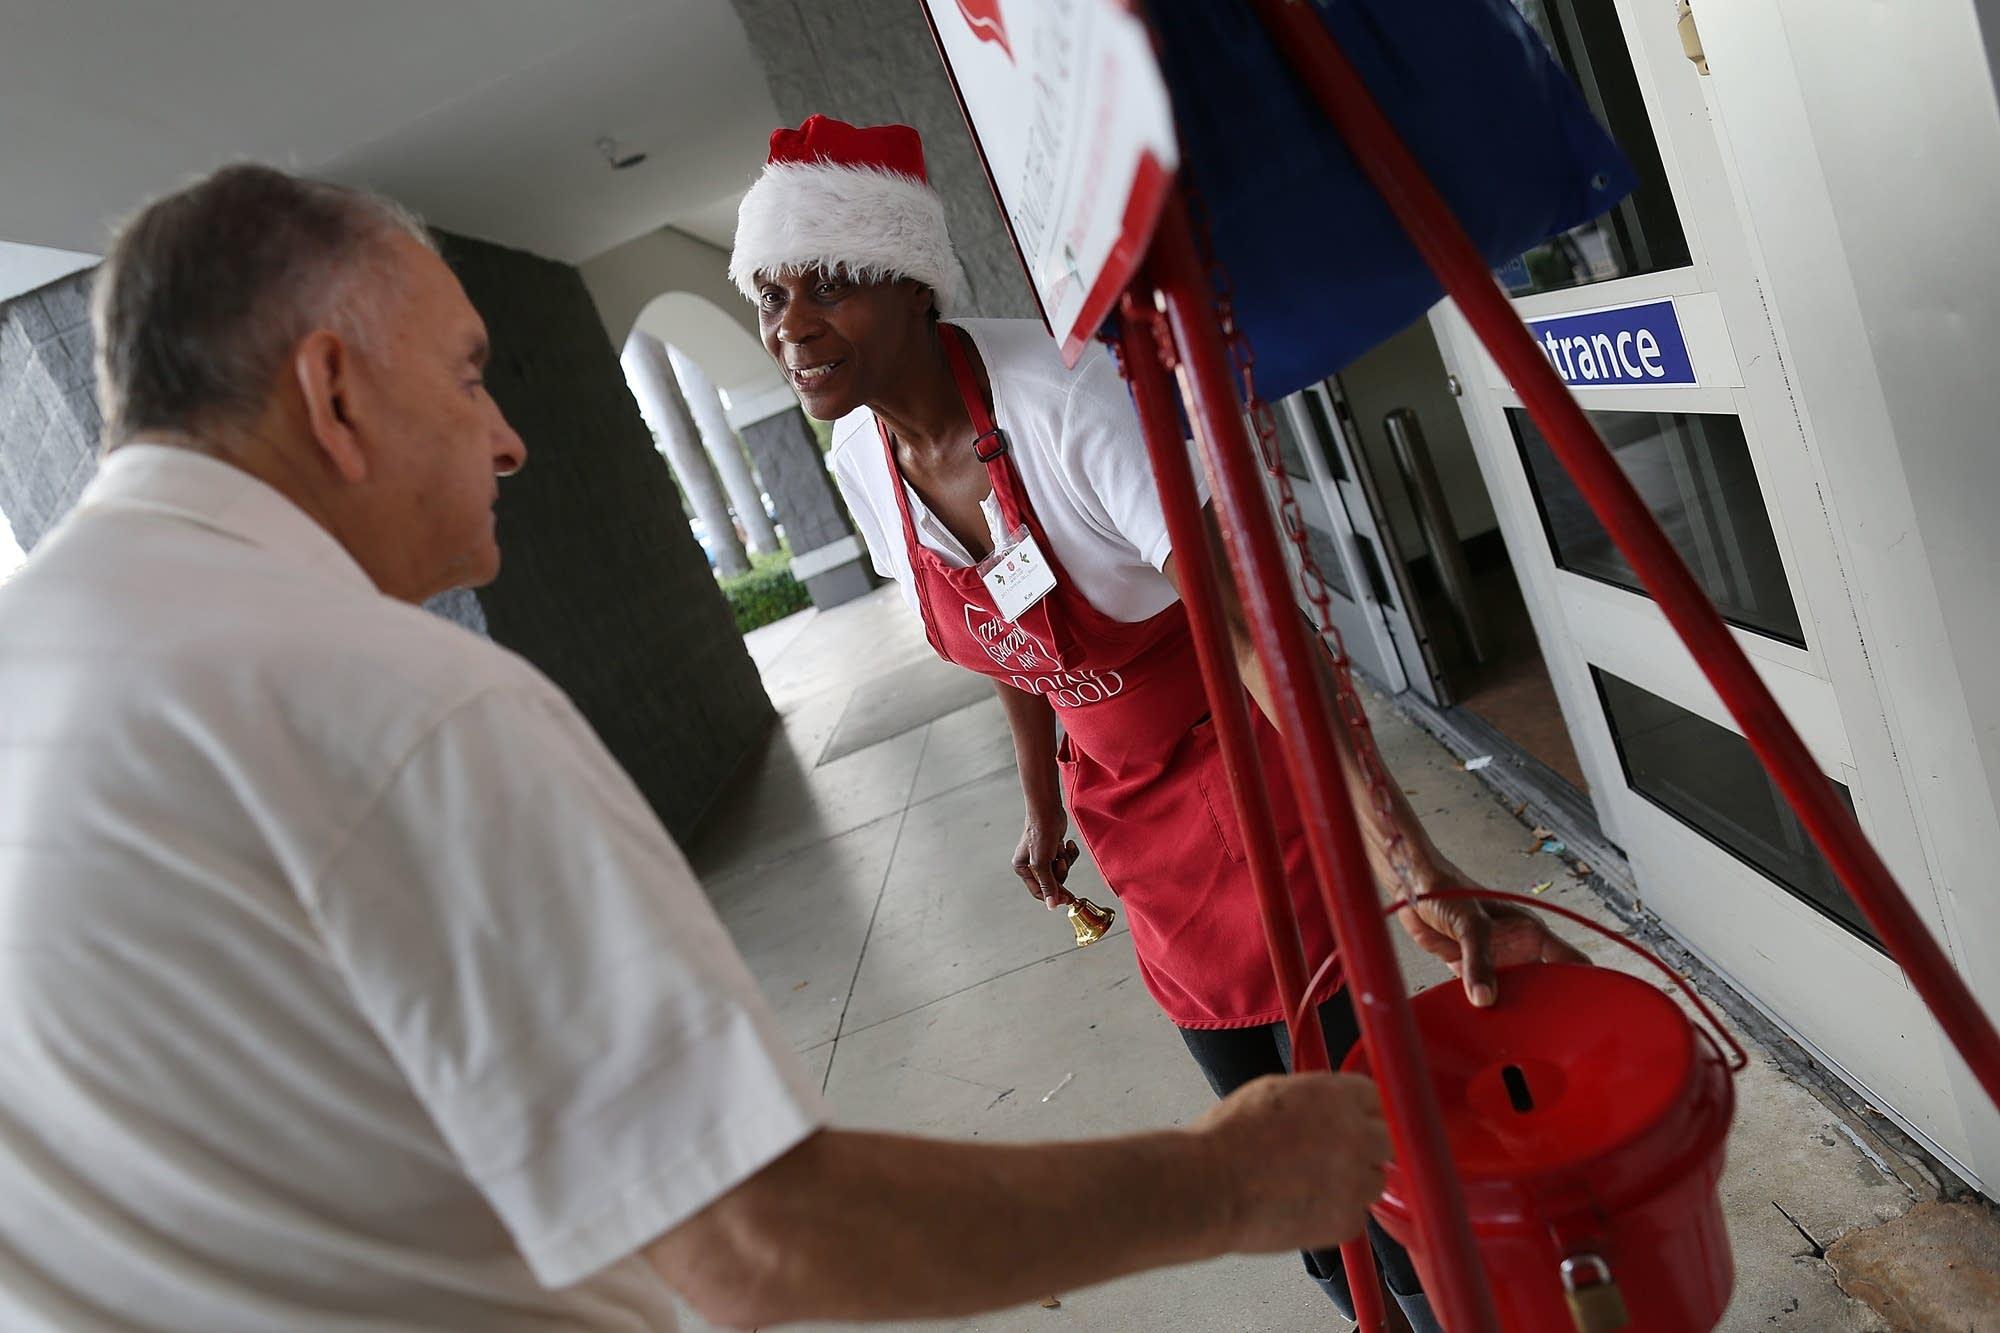 Kim Simmons looks on as Alvaro Burgos makes a donation.